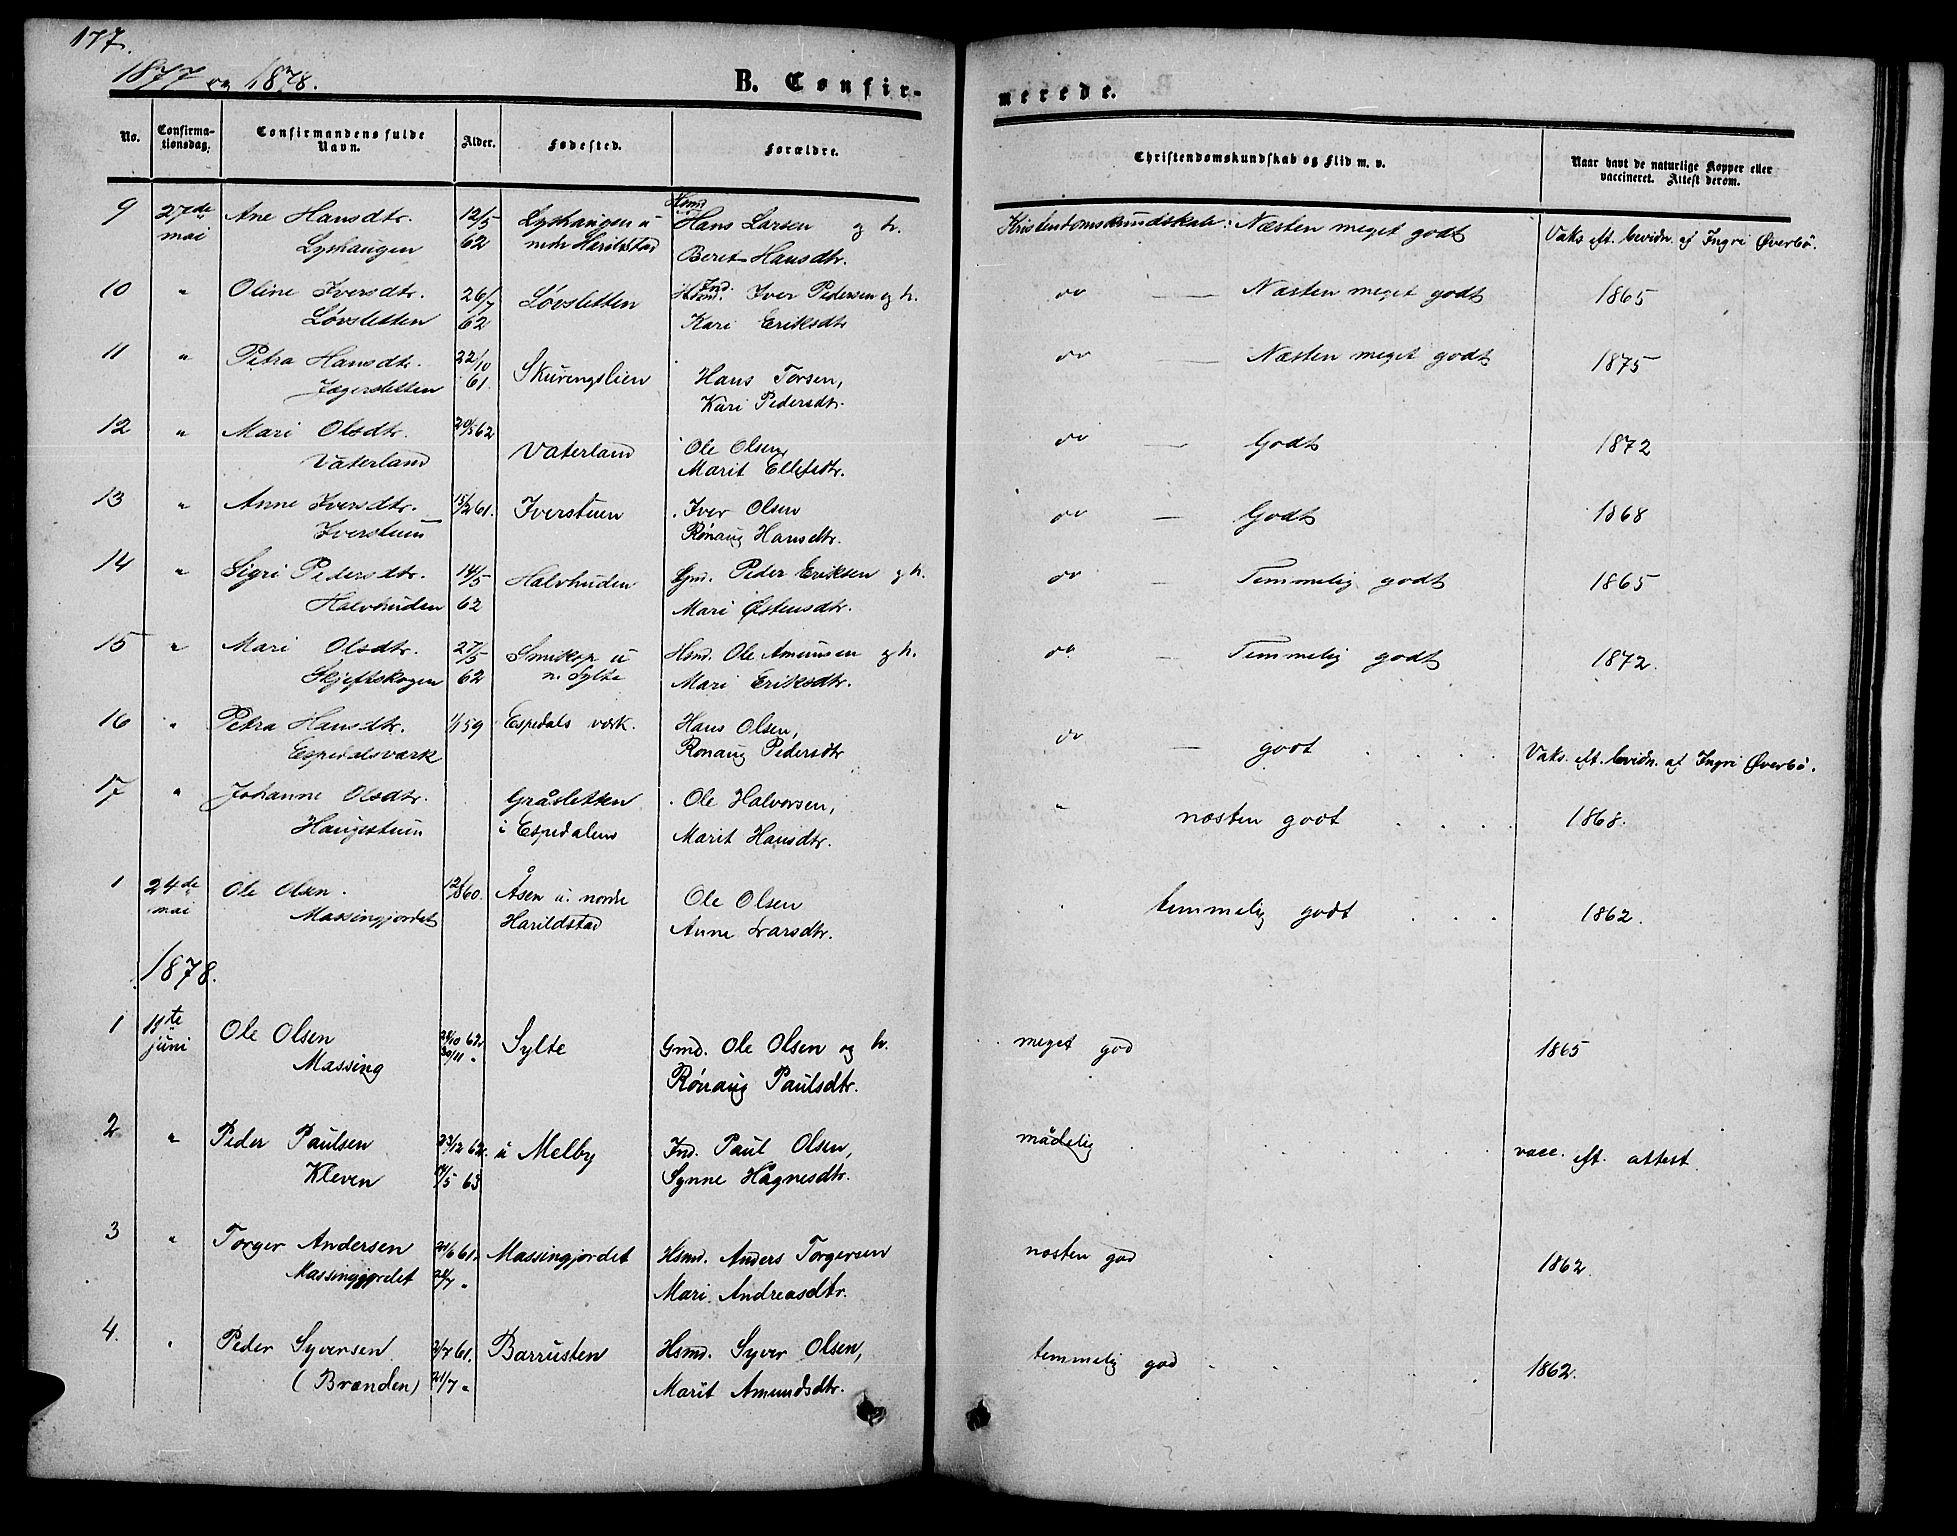 SAH, Nord-Fron prestekontor, Klokkerbok nr. 2, 1851-1883, s. 177